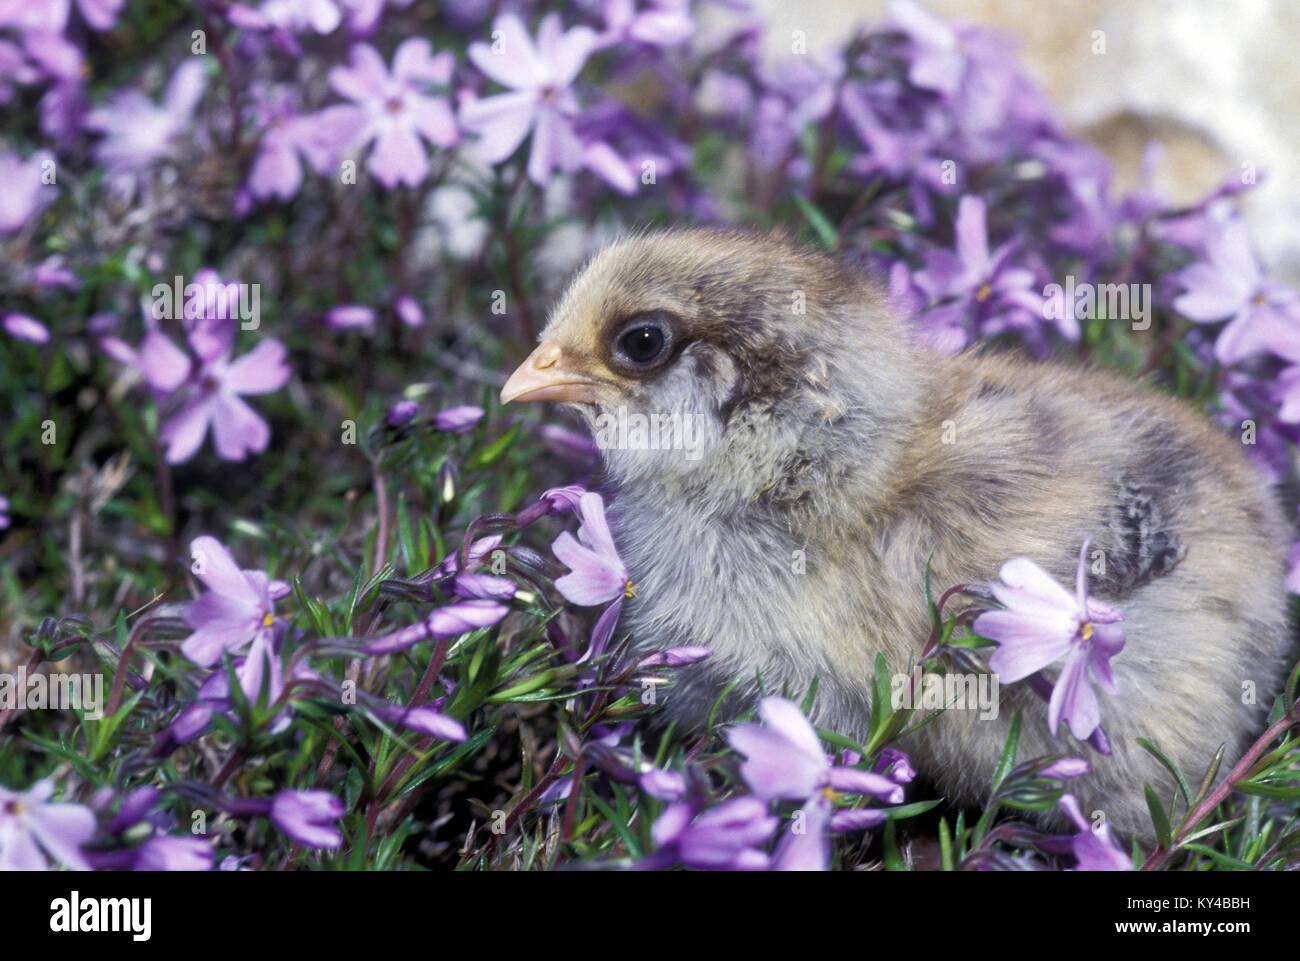 Adorable graue Küken (Gallus gallus) in Lavendel Phlox (Phlox stolonifera) im Frühling, Missouri, USA. Stockbild